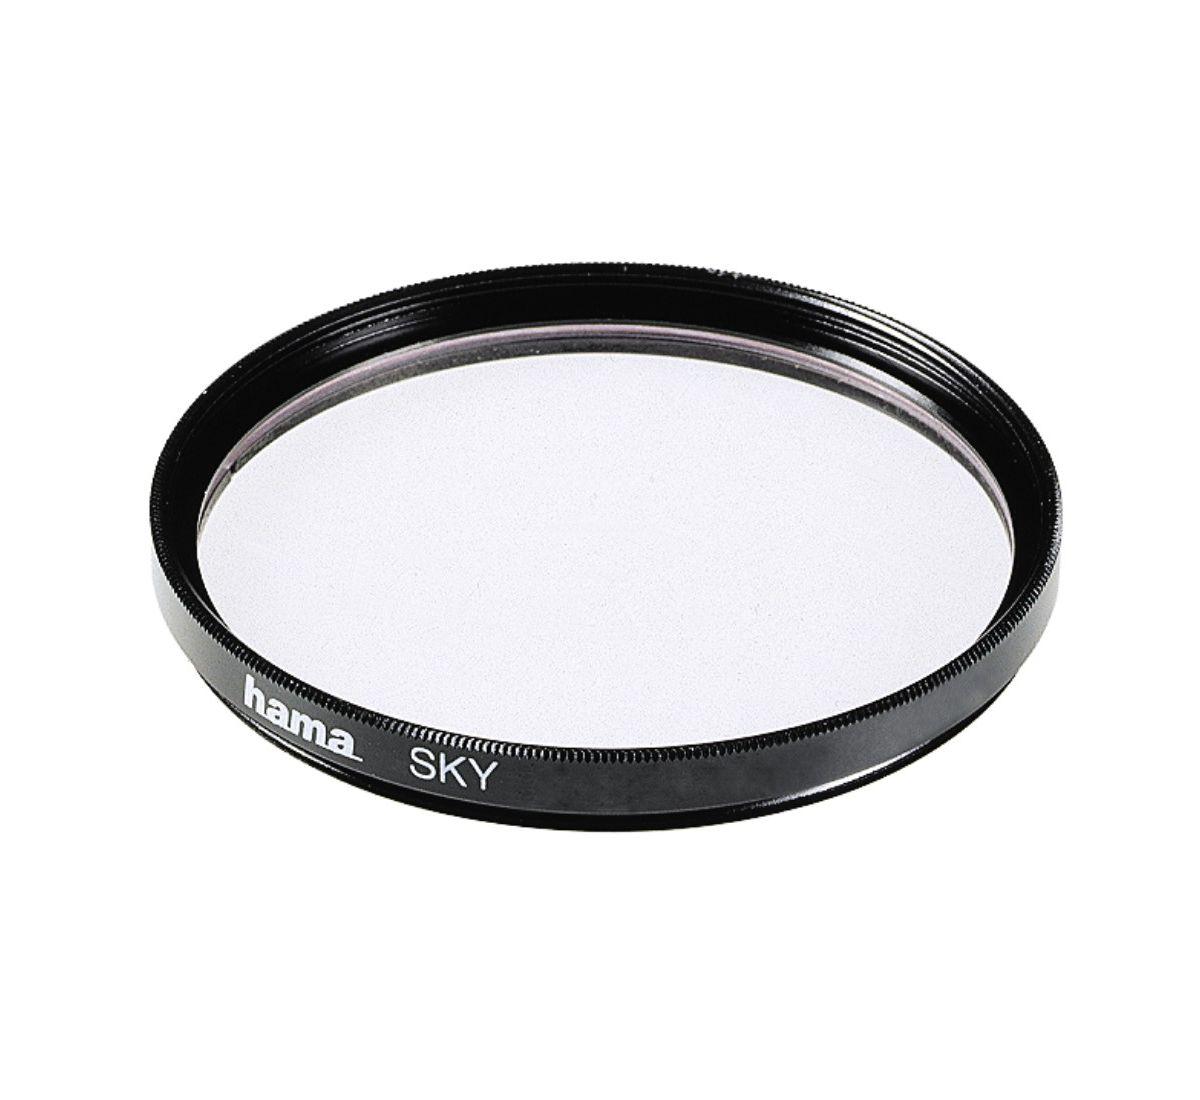 Hama Skylight-Filter, coated, 62,0 mm